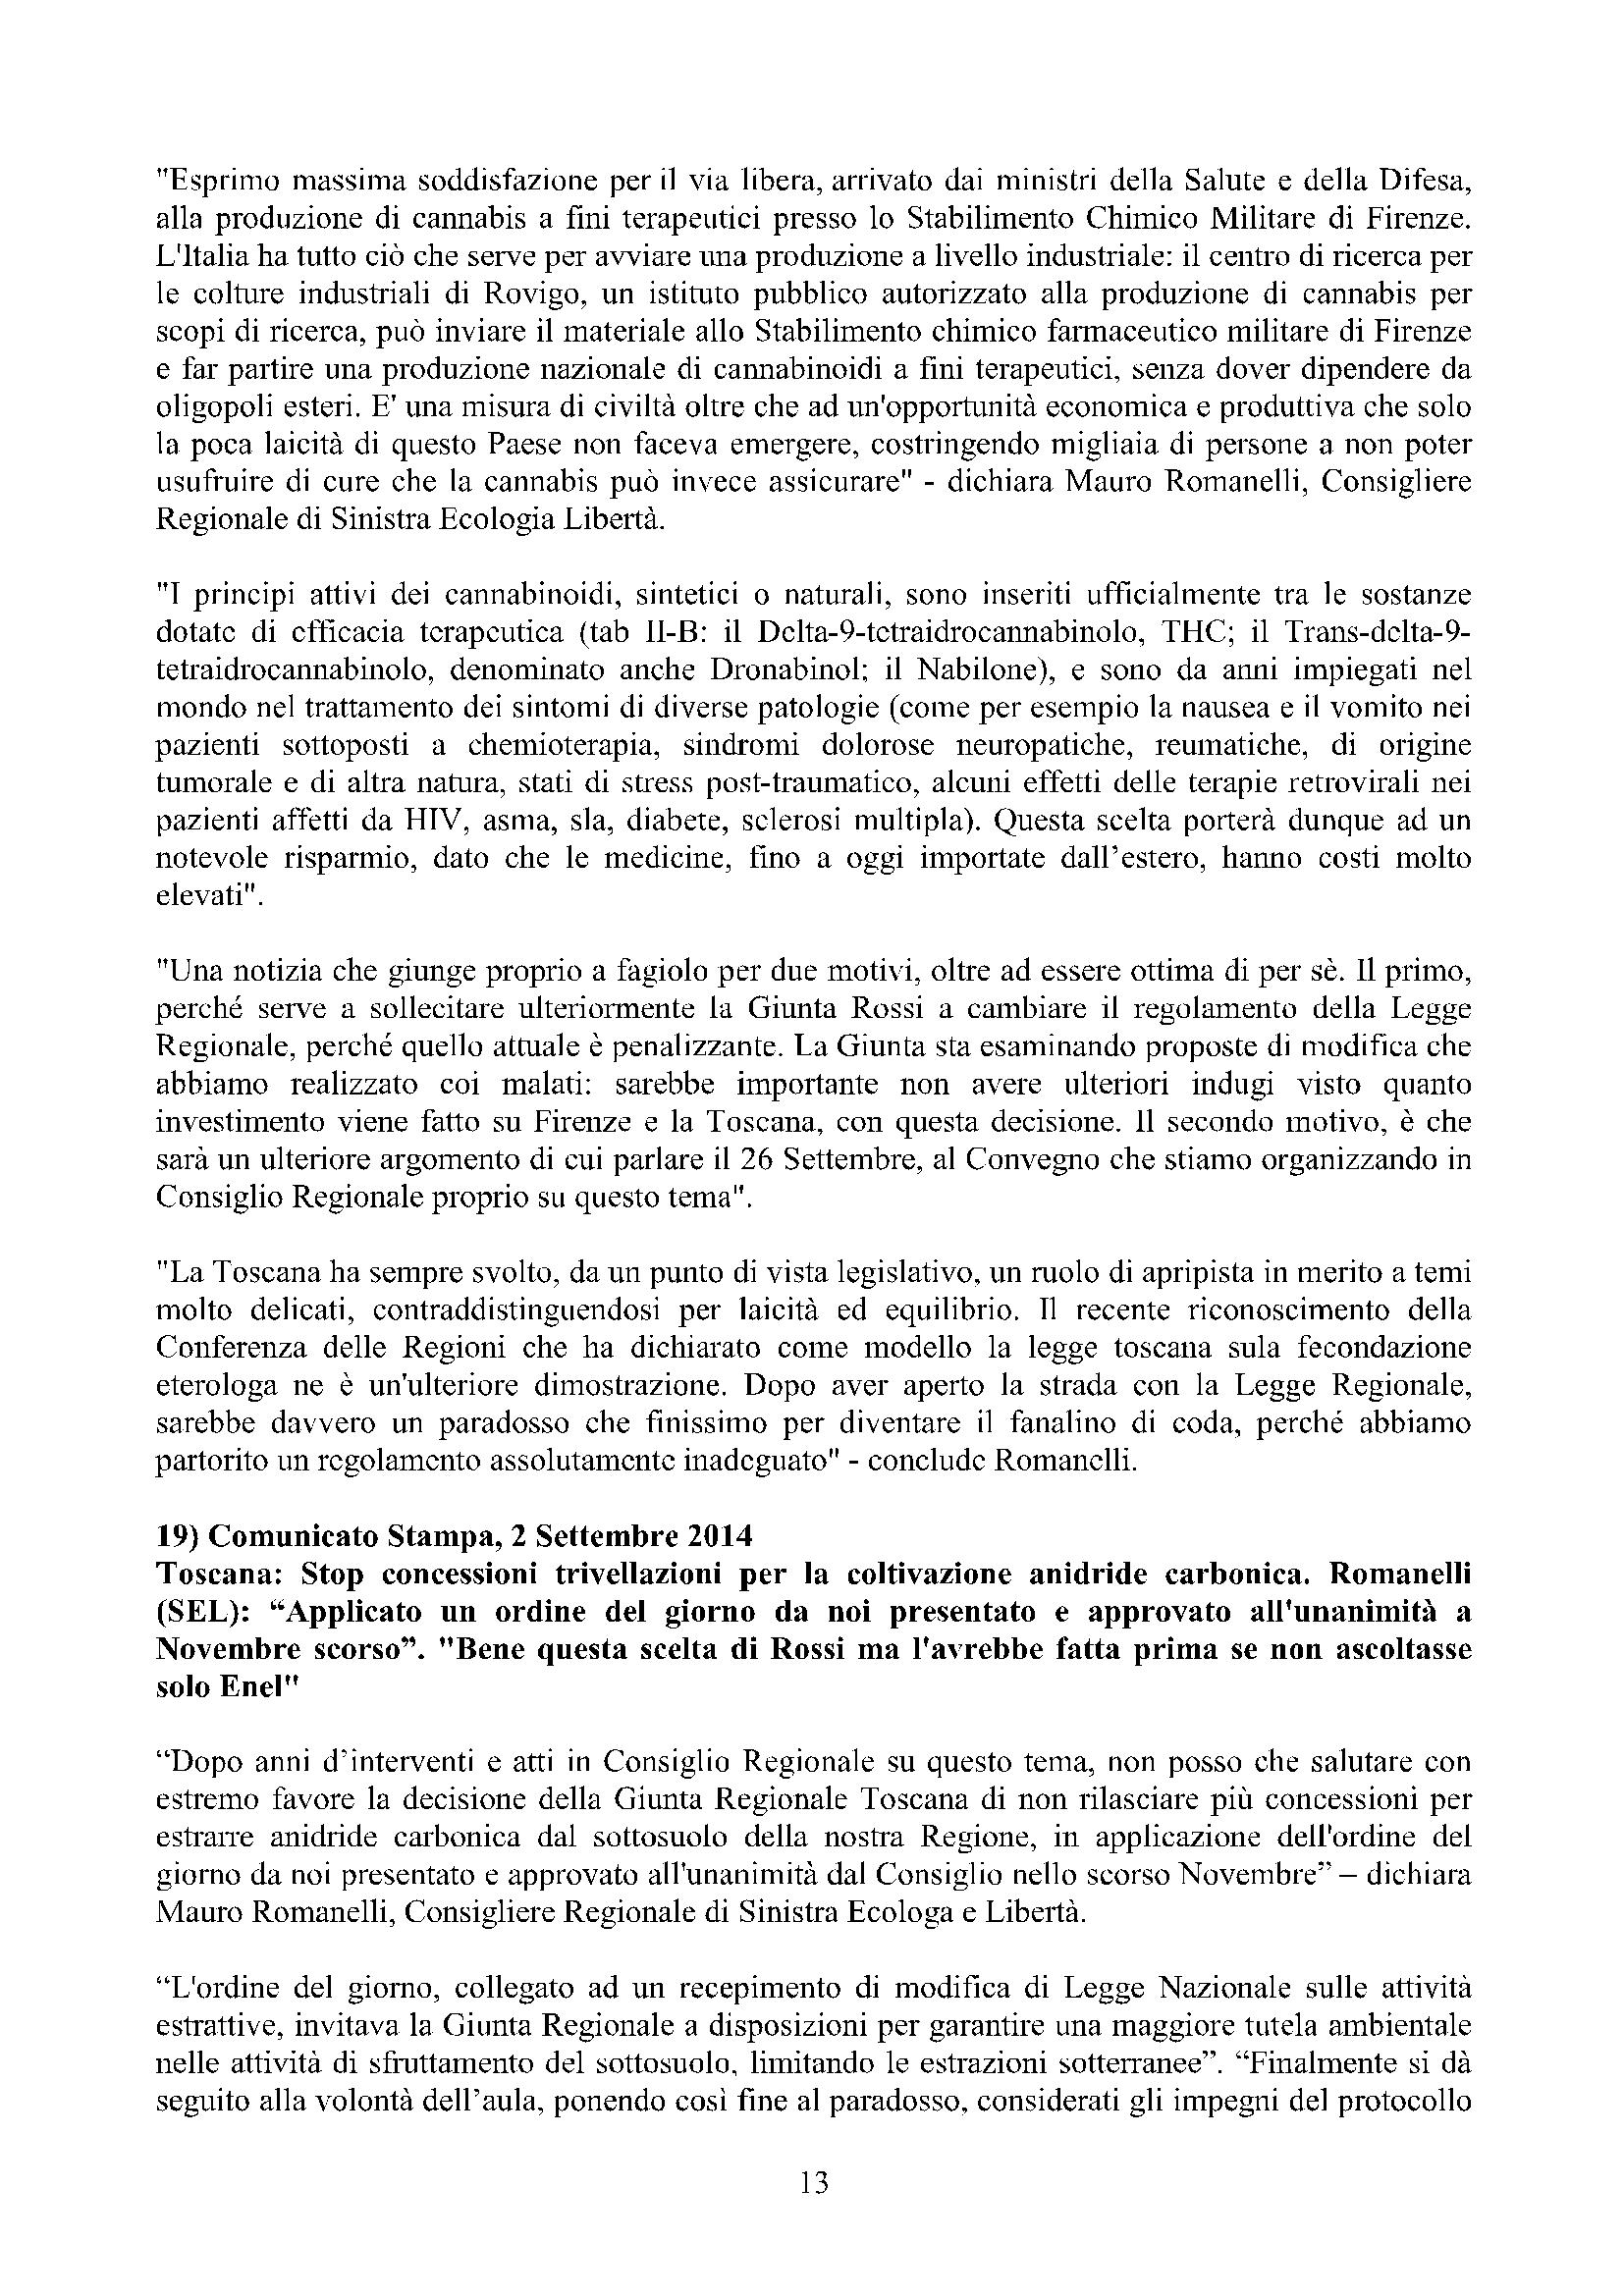 Newsletter di MAURO ROMANELLI Ottobre 2014 – 13